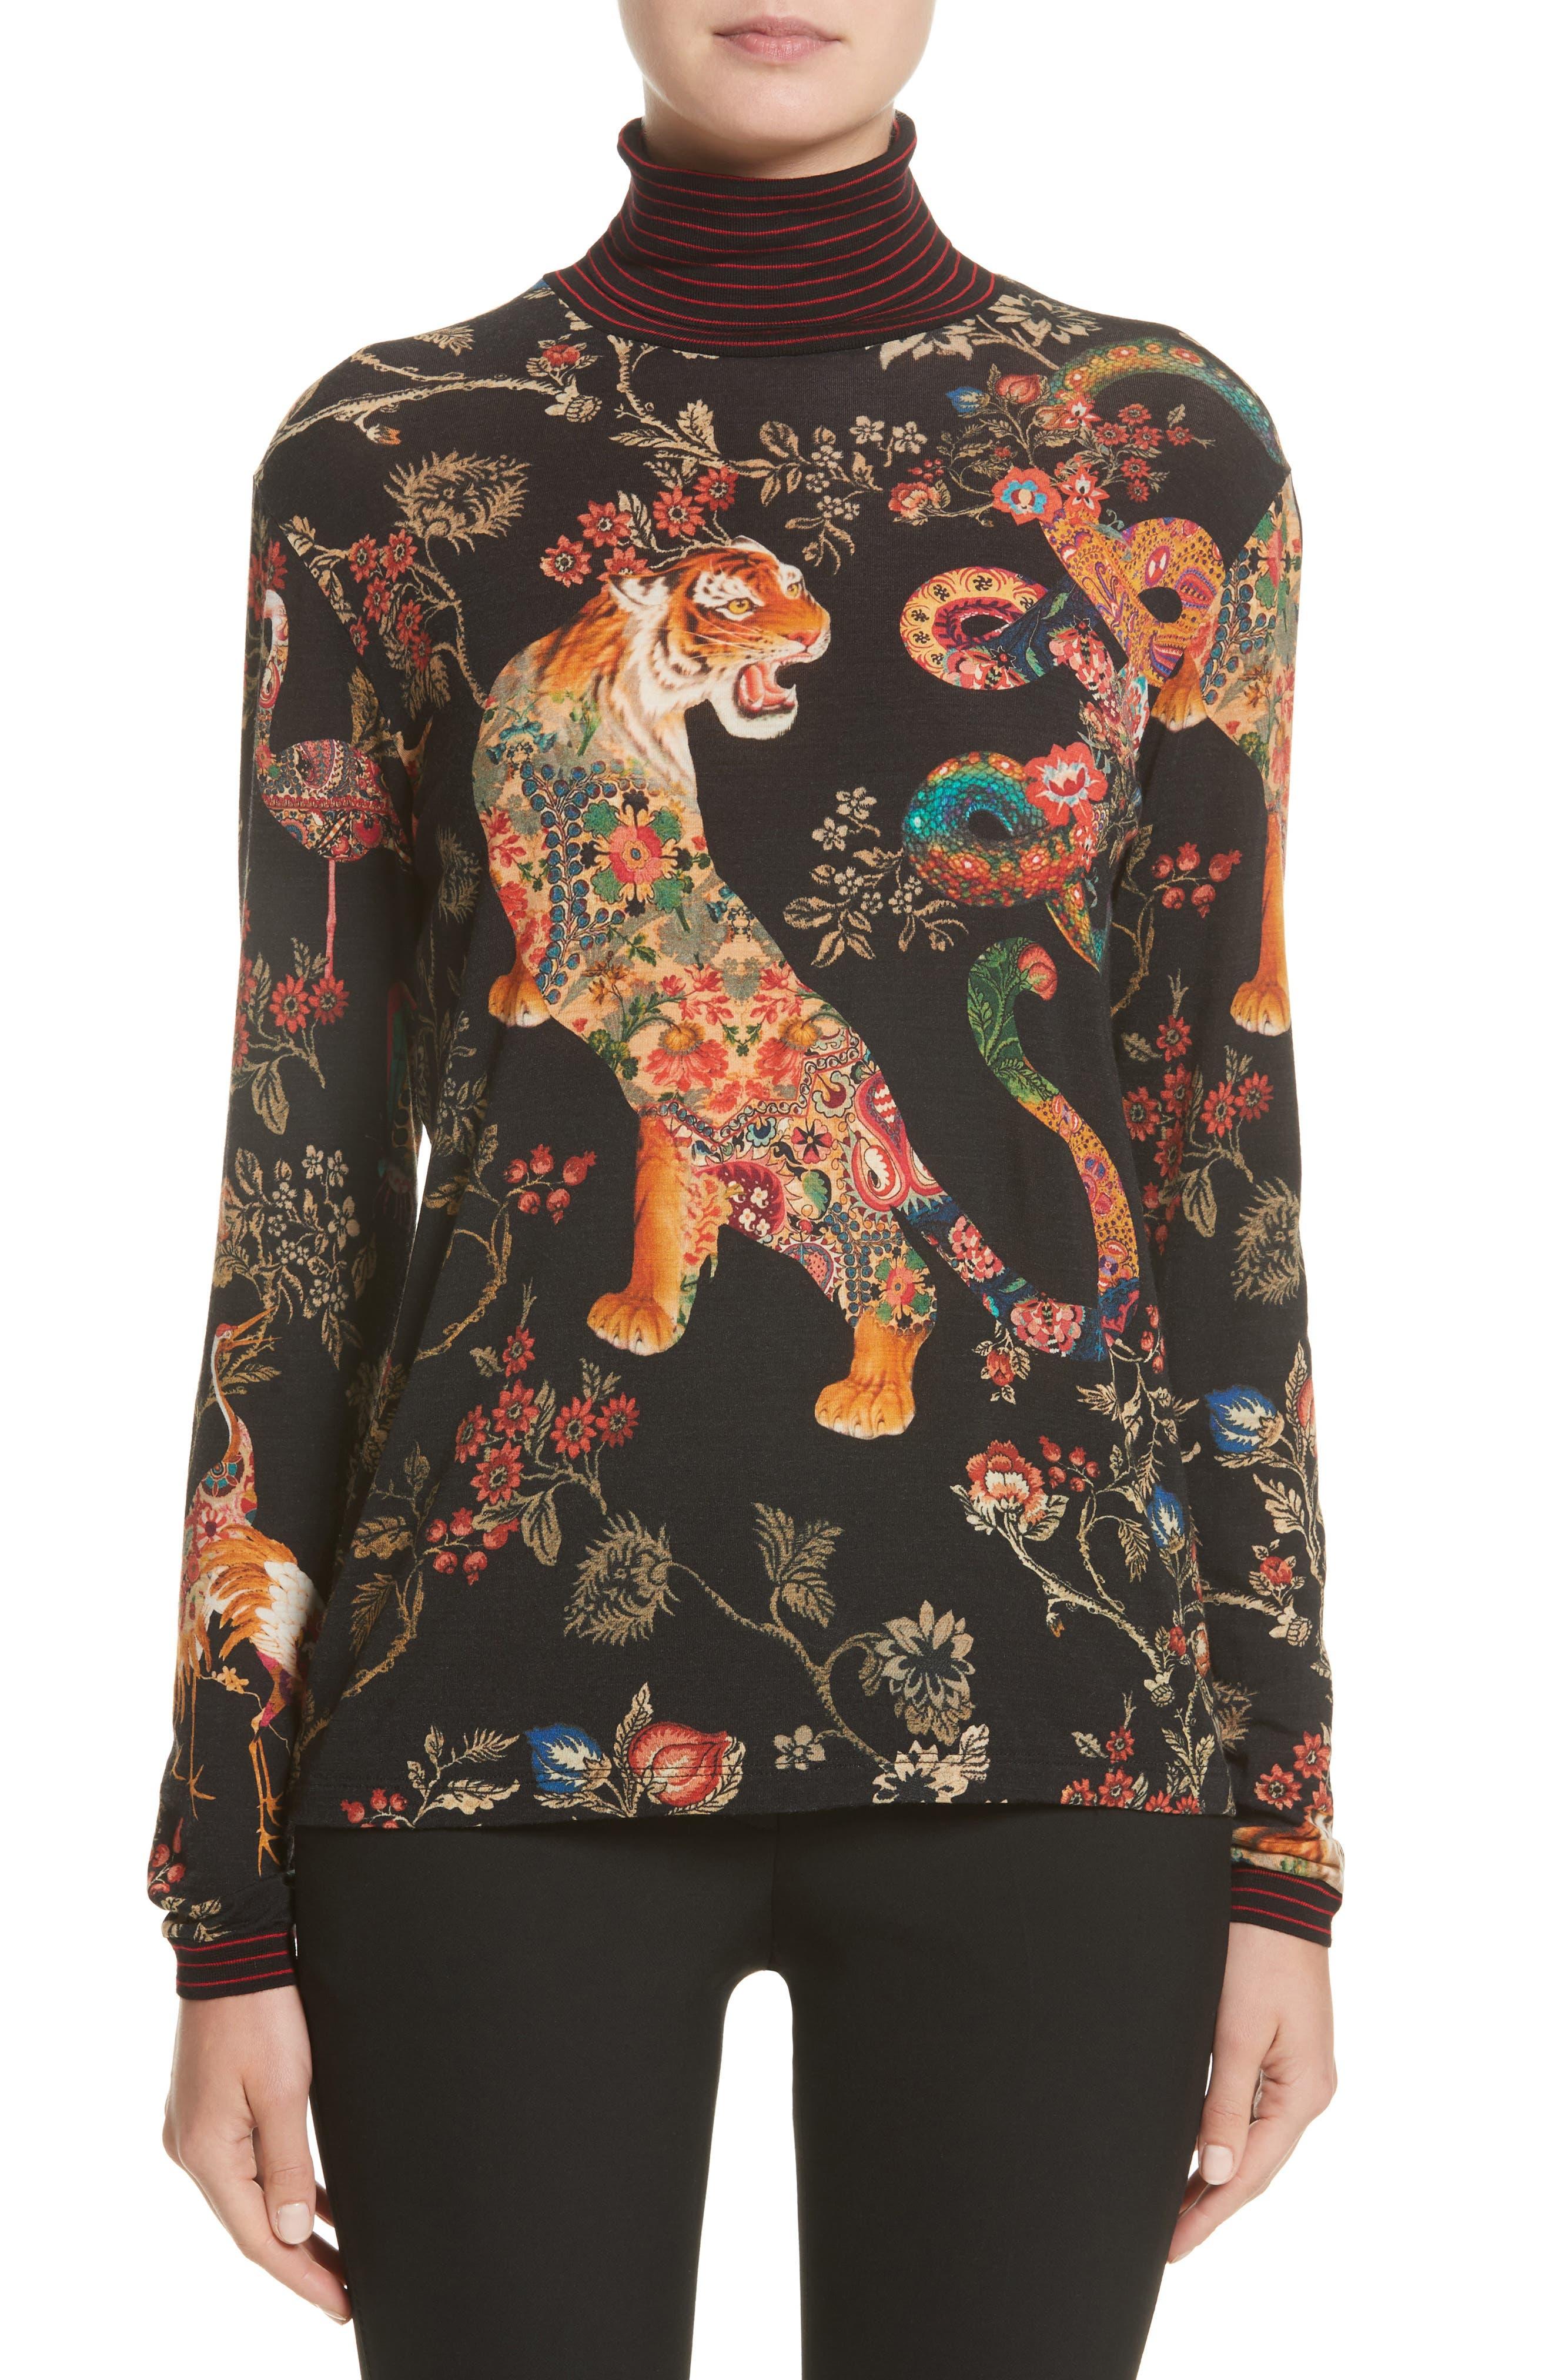 Alternate Image 1 Selected - Etro Tiger Print Mock Neck Sweater